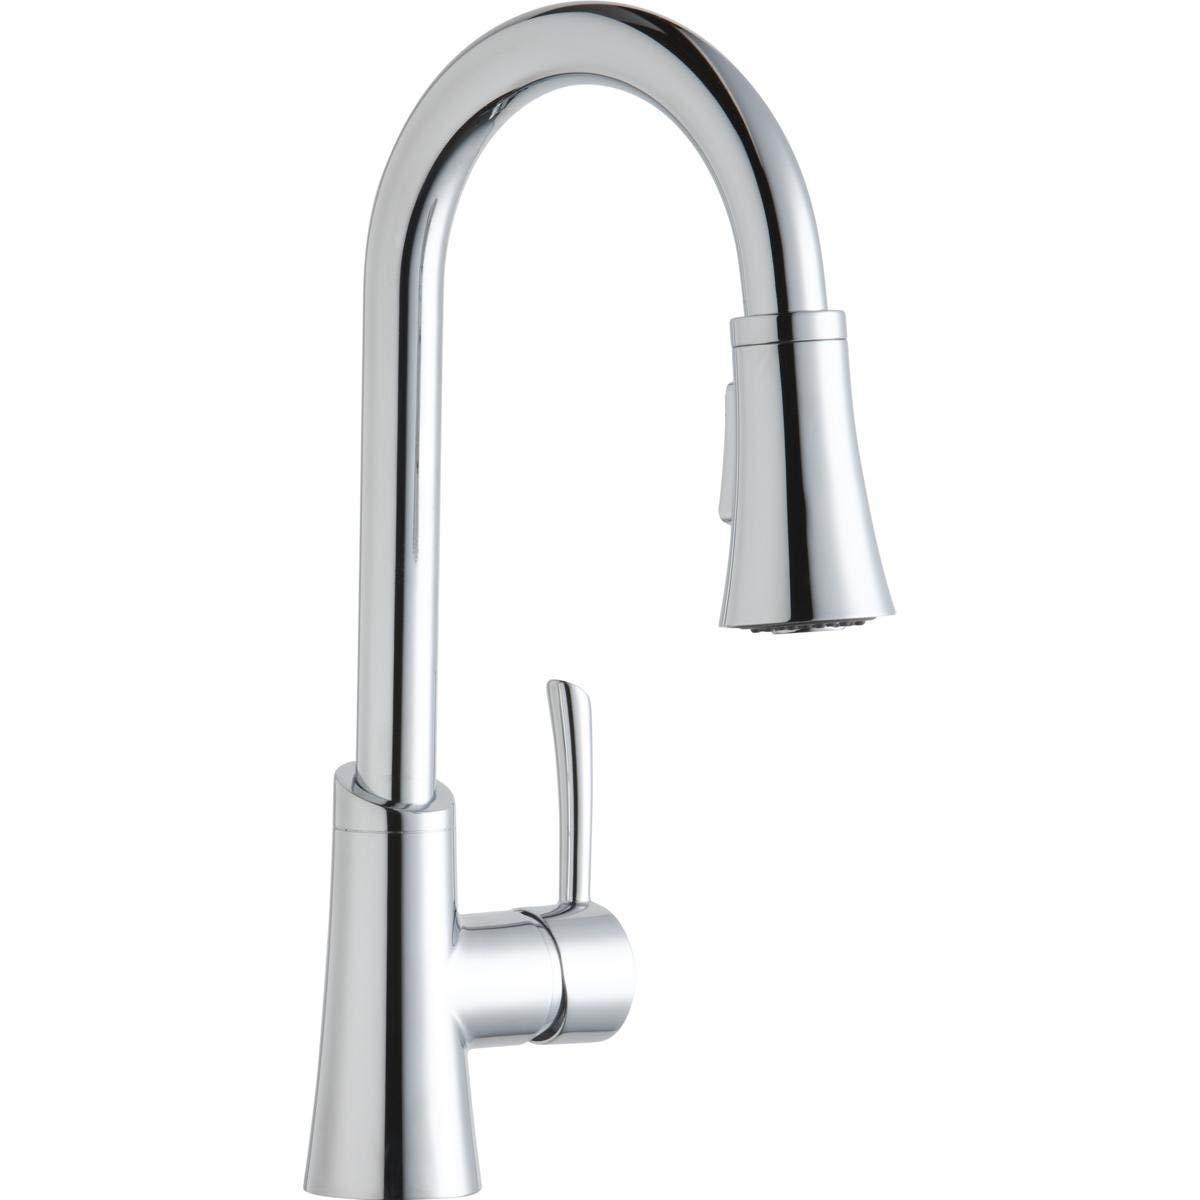 Elkay LKGT3032CR Gourmet Chrome Single Lever Pull-down Spray Bar Faucet